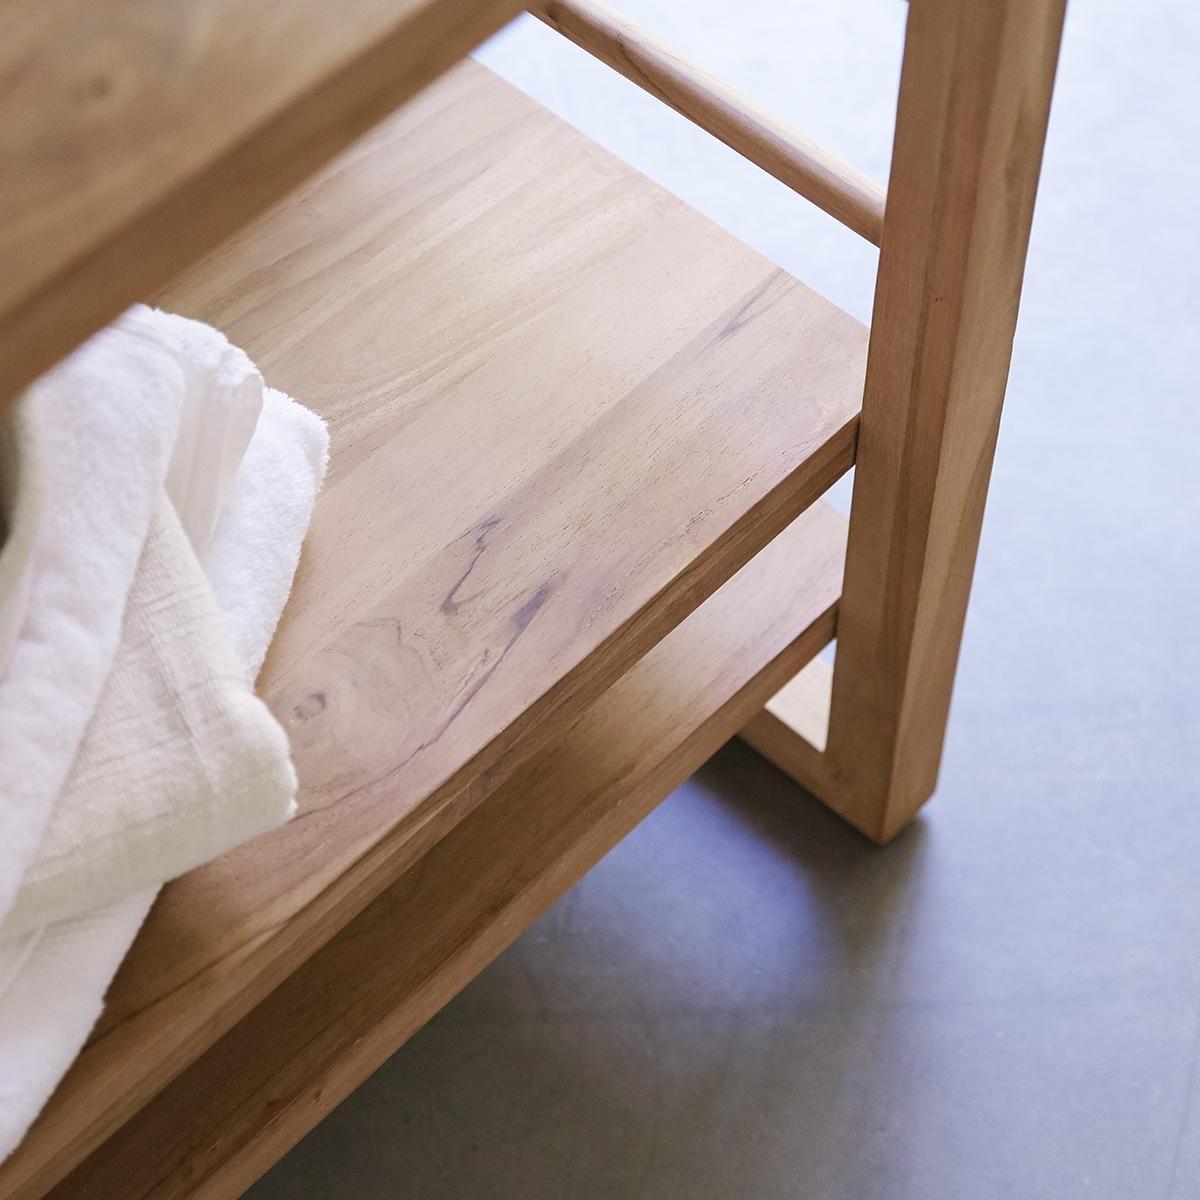 Regal Fur Badezimmer Aus Teakholz 115 Sera In 2020 Bathroom